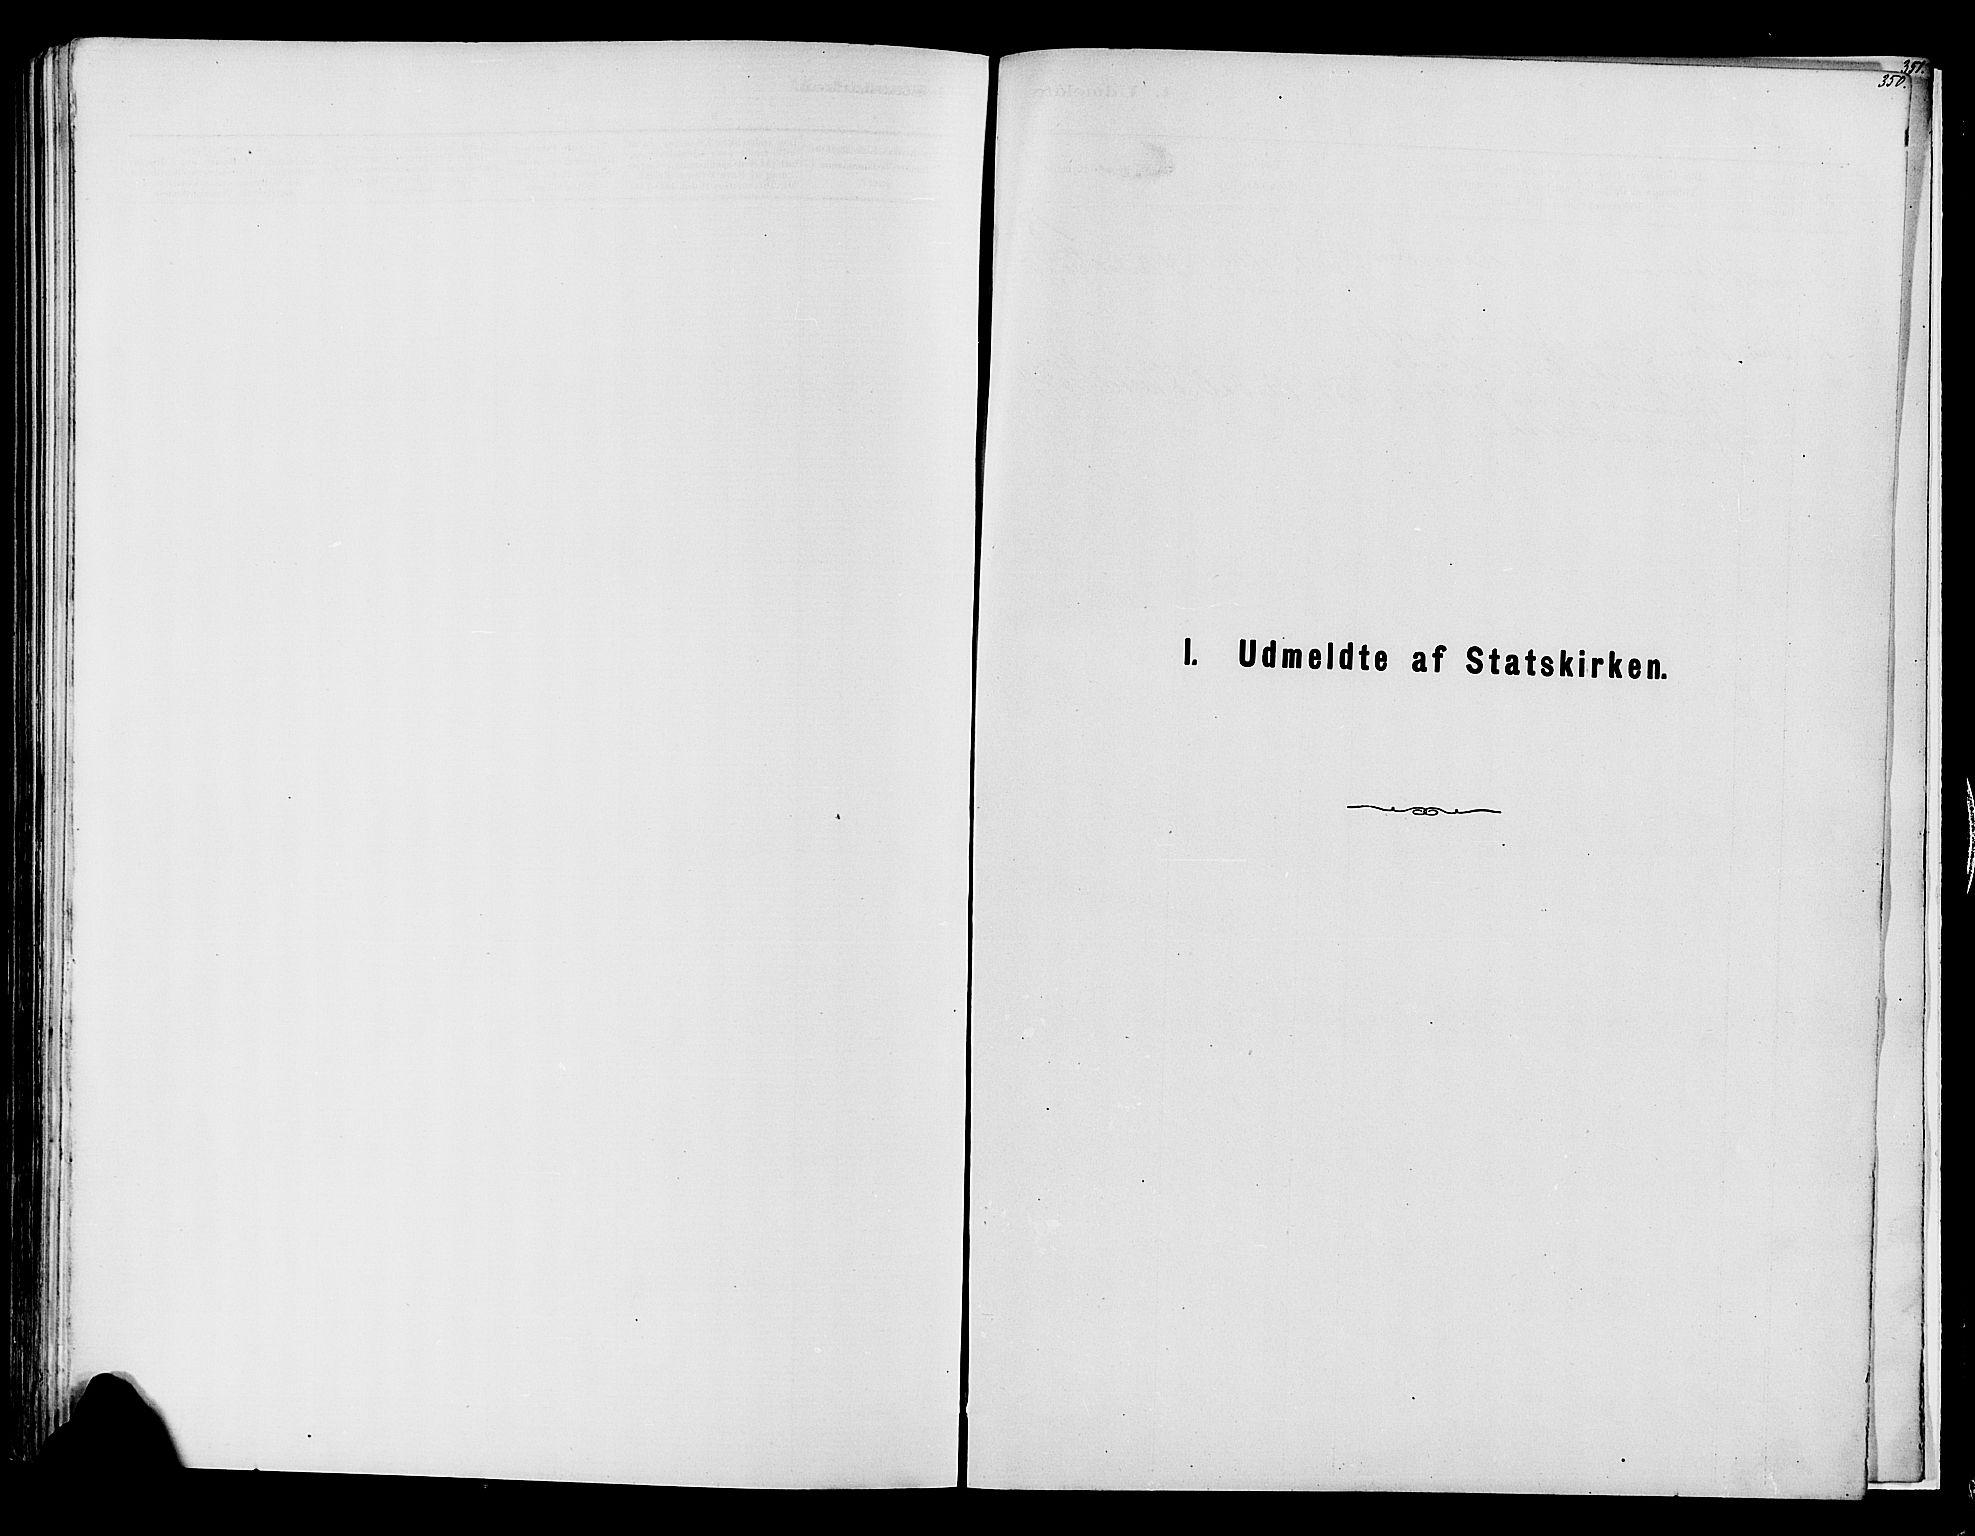 SAH, Vardal prestekontor, H/Ha/Haa/L0008: Ministerialbok nr. 8, 1878-1890, s. 350